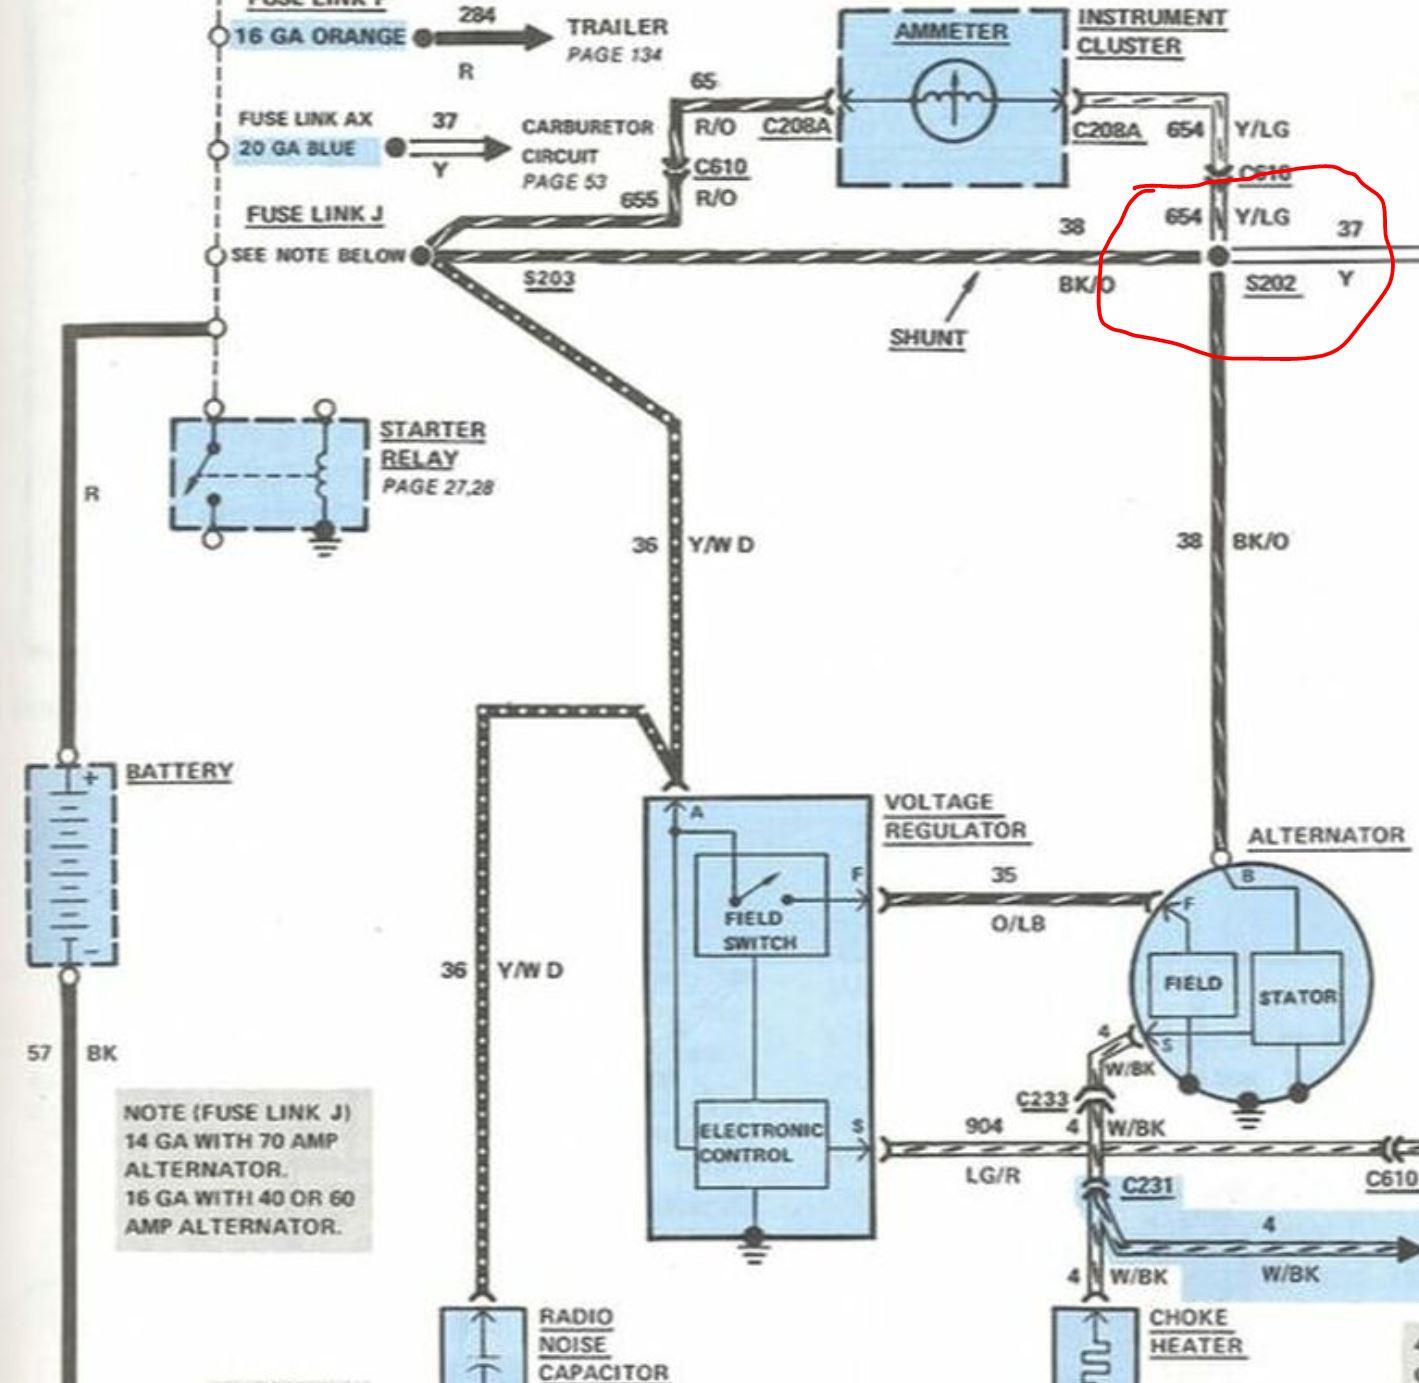 hight resolution of bullnose enthusiasts 1982 bronco alternator wiring mess 3g wiring after conversion 3g alternator last edited by ardwrkntrk